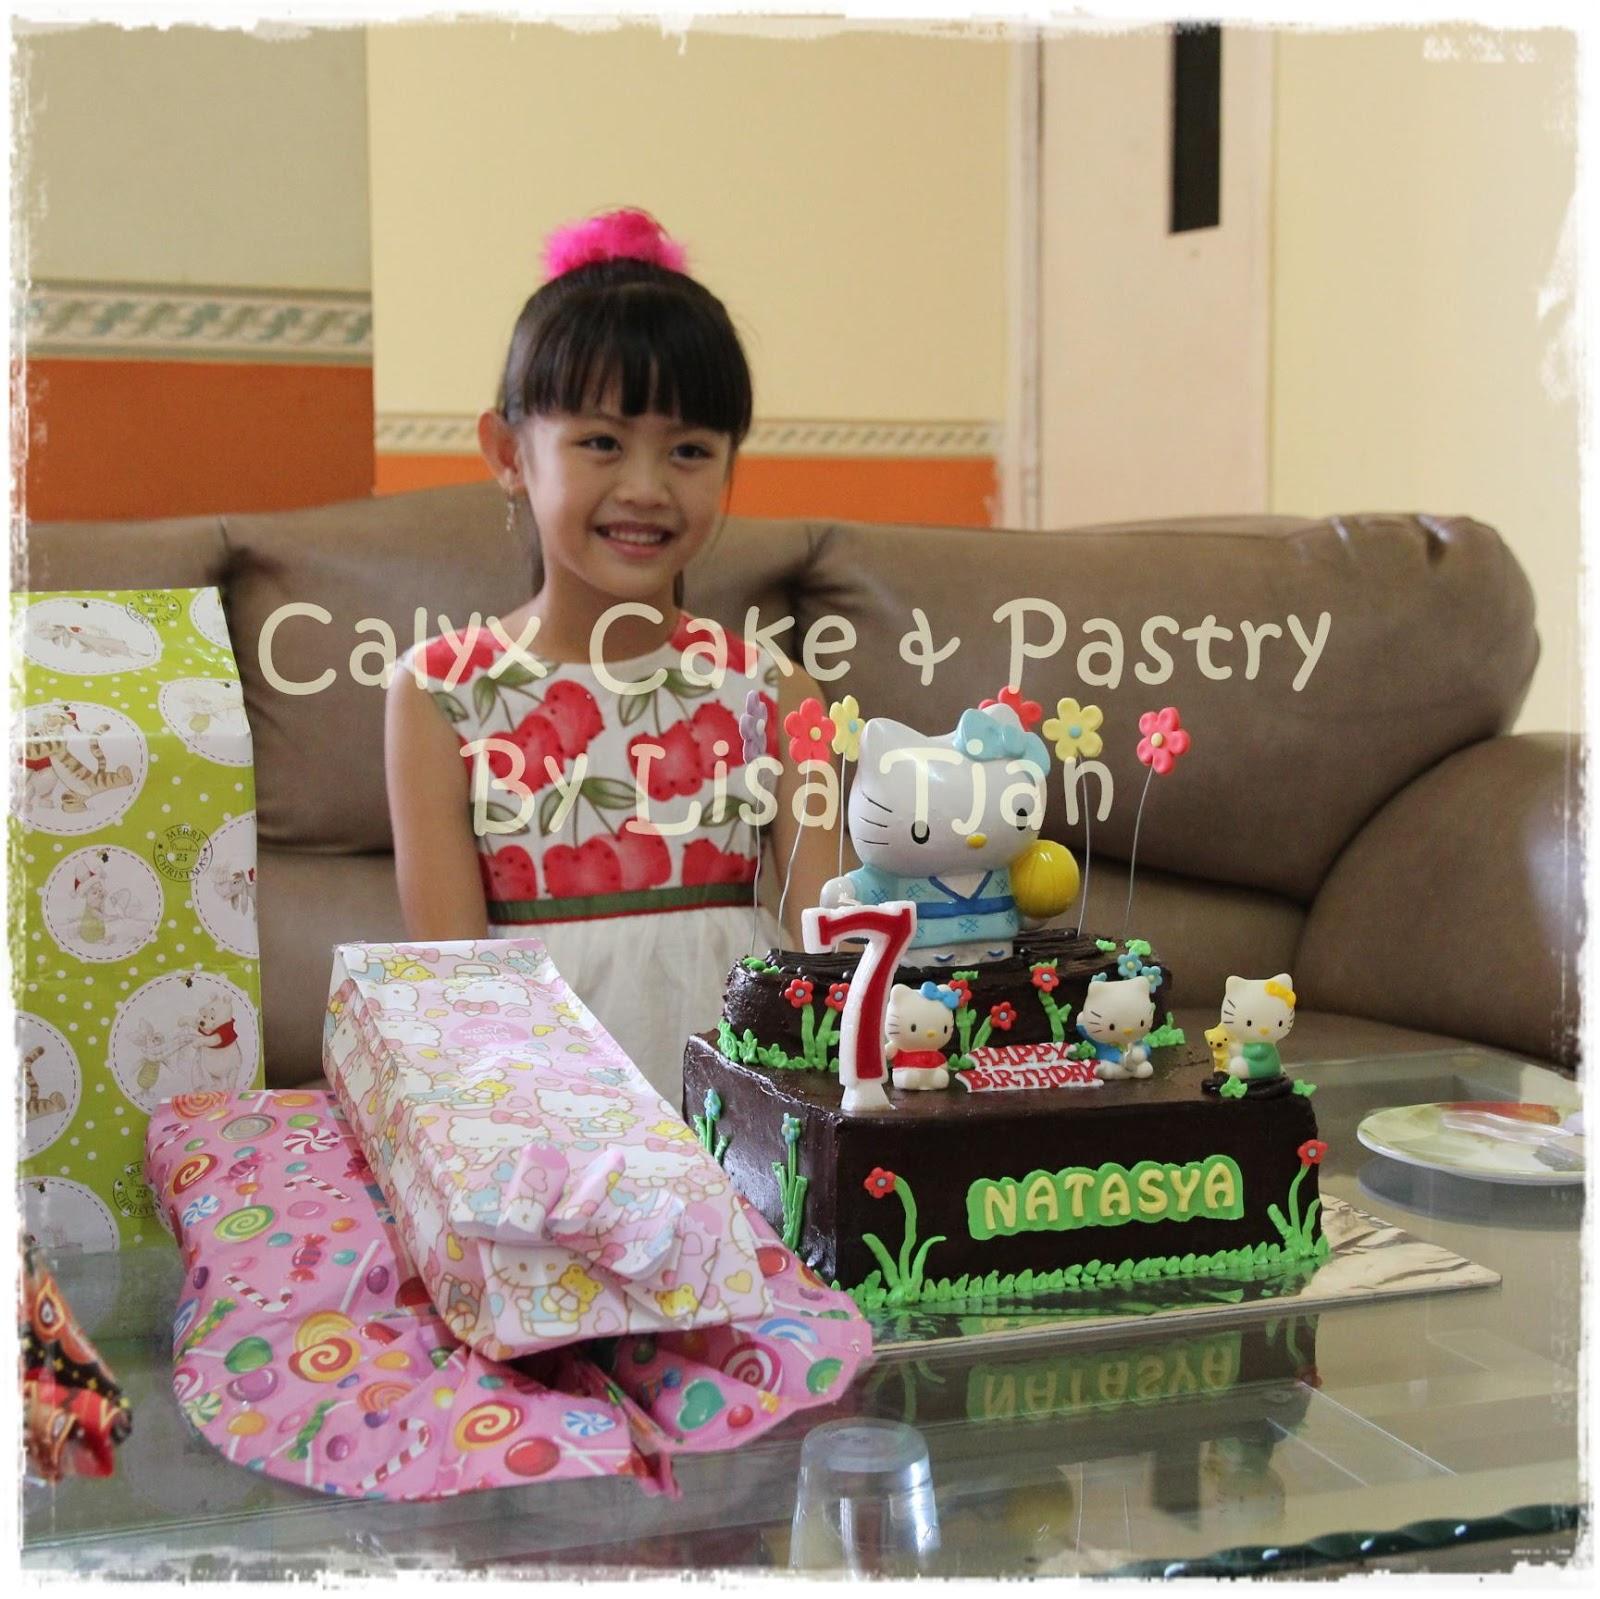 Calyx Cake Amp Pastry Januari 2013